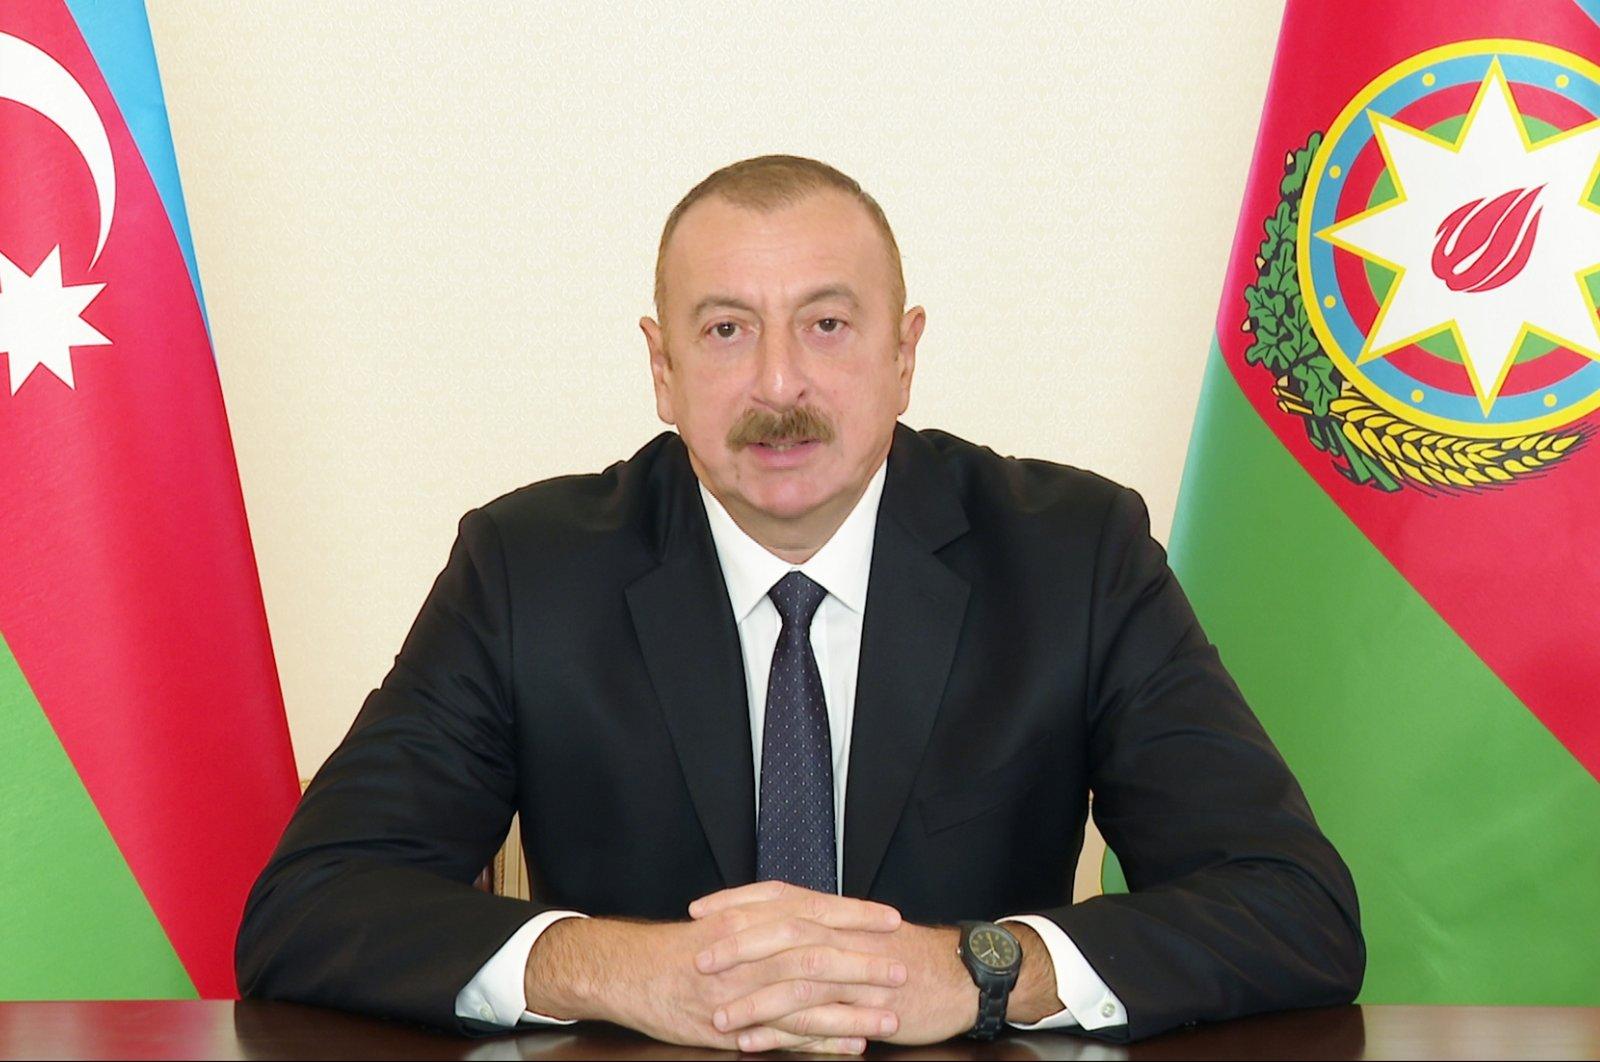 Azerbaijan's President Ilham Aliyev addresses the nation in the capital Baku, Oct. 26, 2020. (AA Photo)